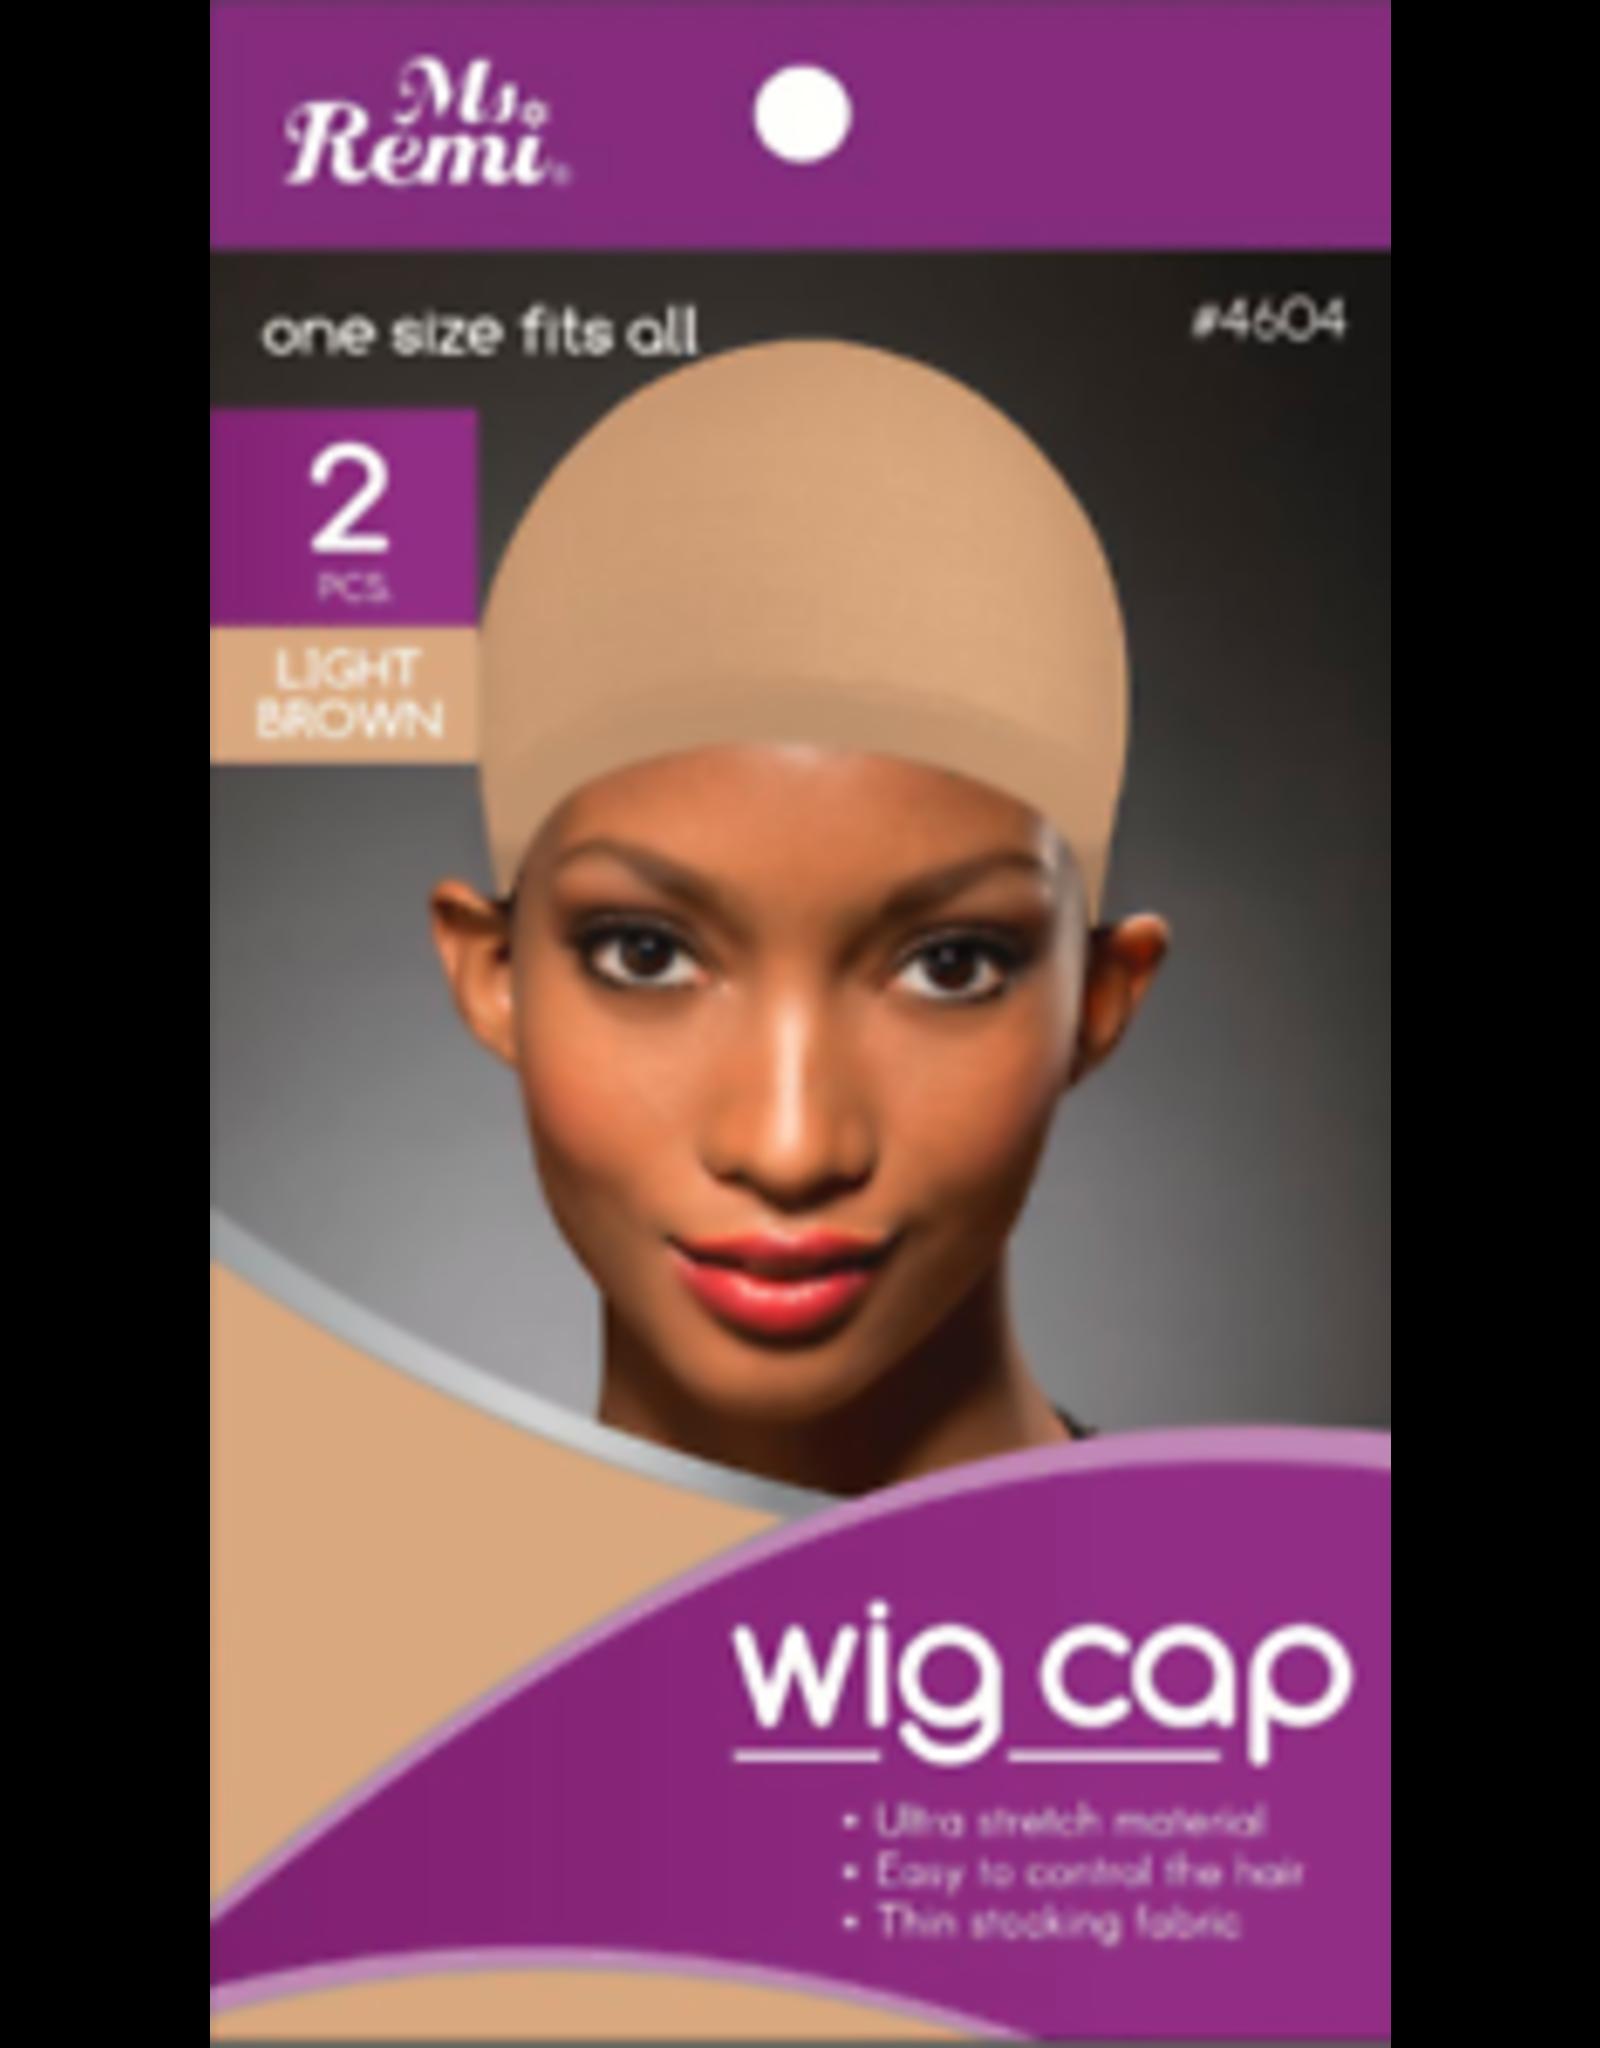 JOAN INTERNATIONAL MS. REMI WIG CAP -NATURAL 2PCS